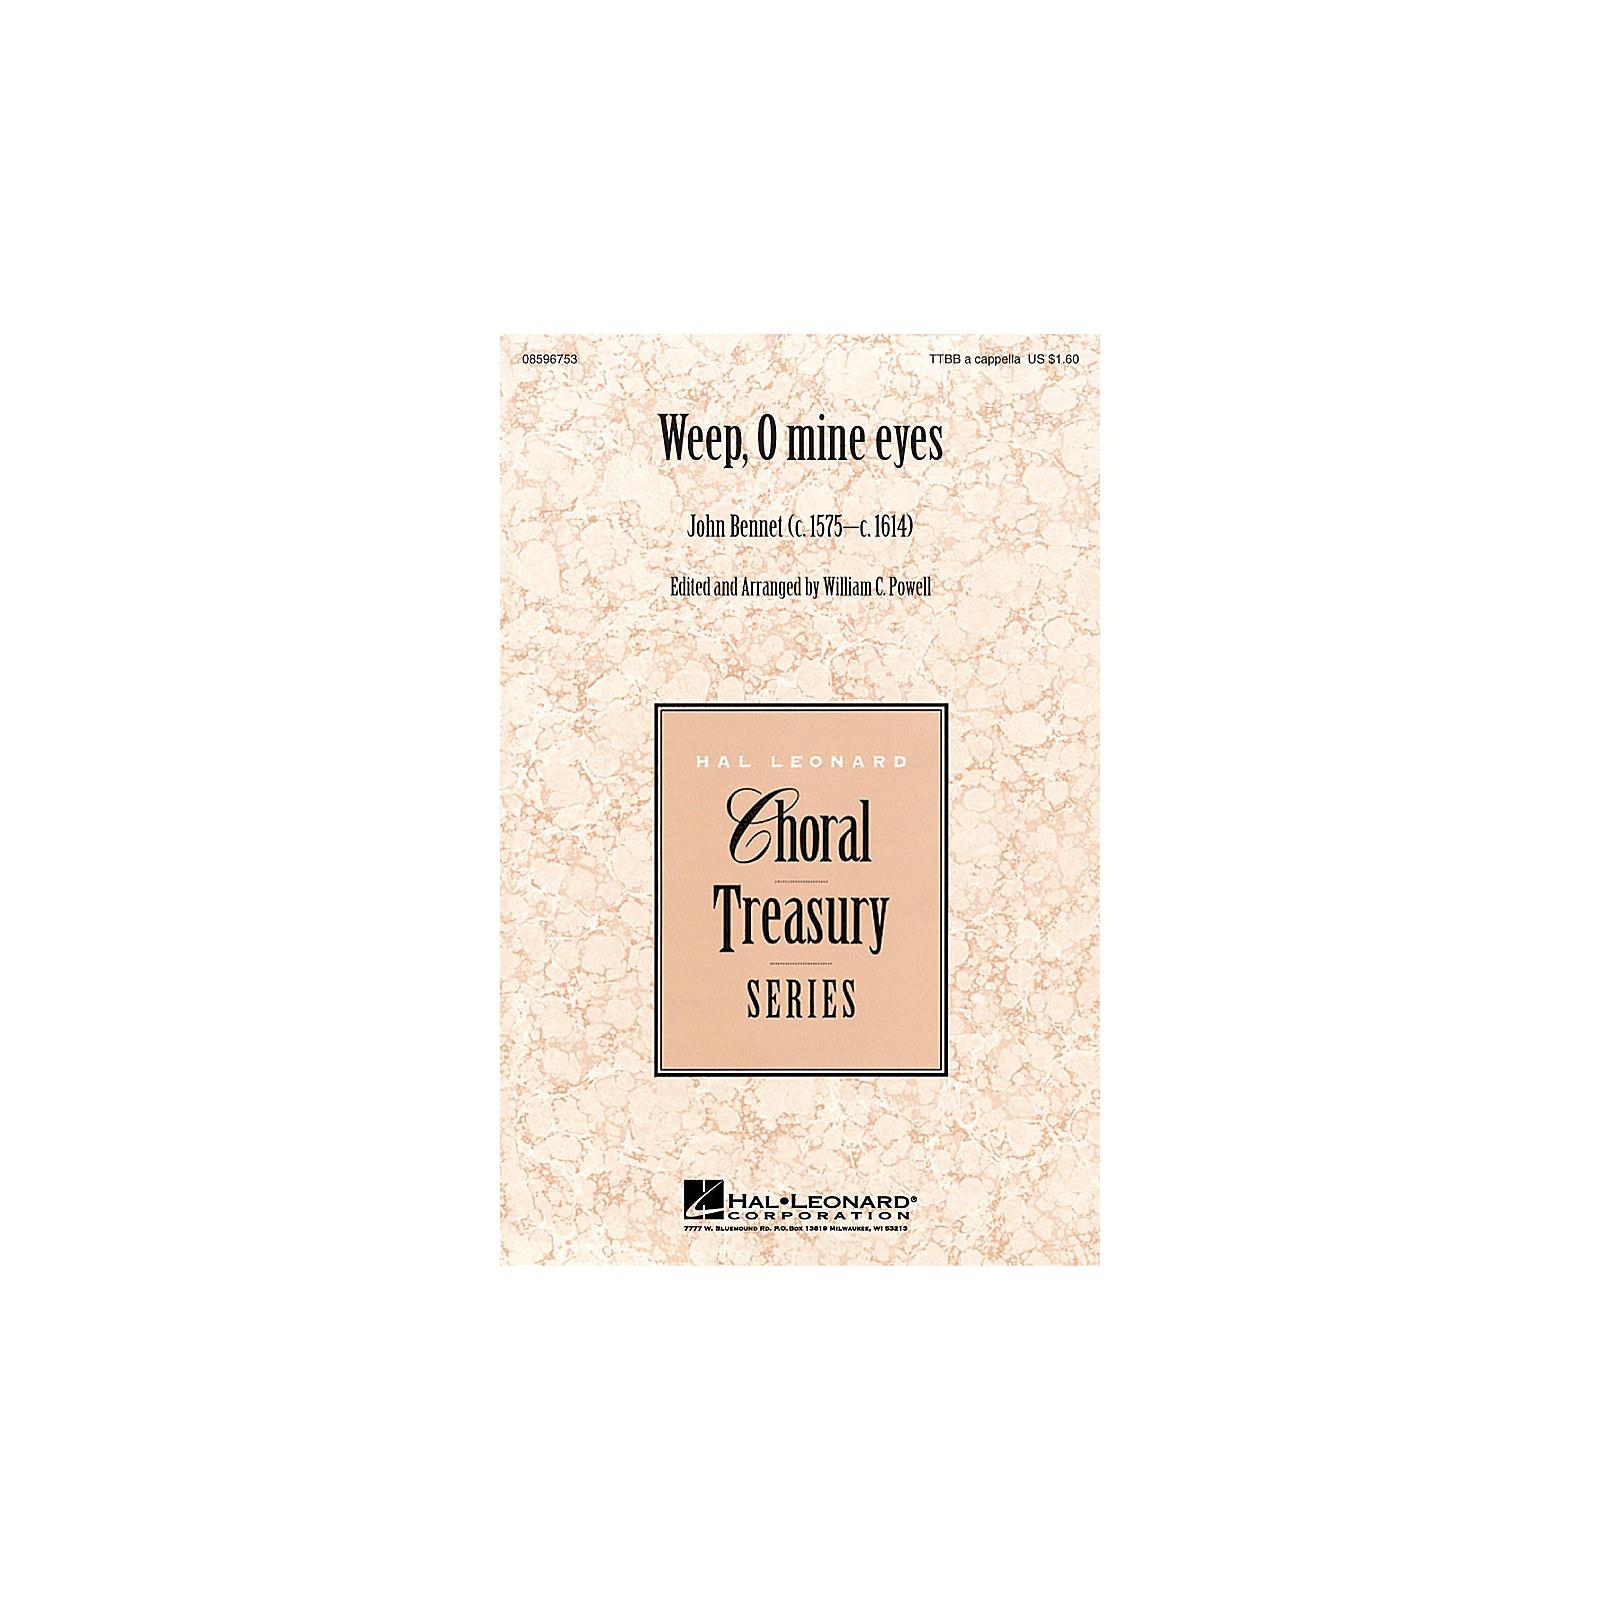 Hal Leonard Weep, O Mine Eyes TTBB A Cappella arranged by William Powell